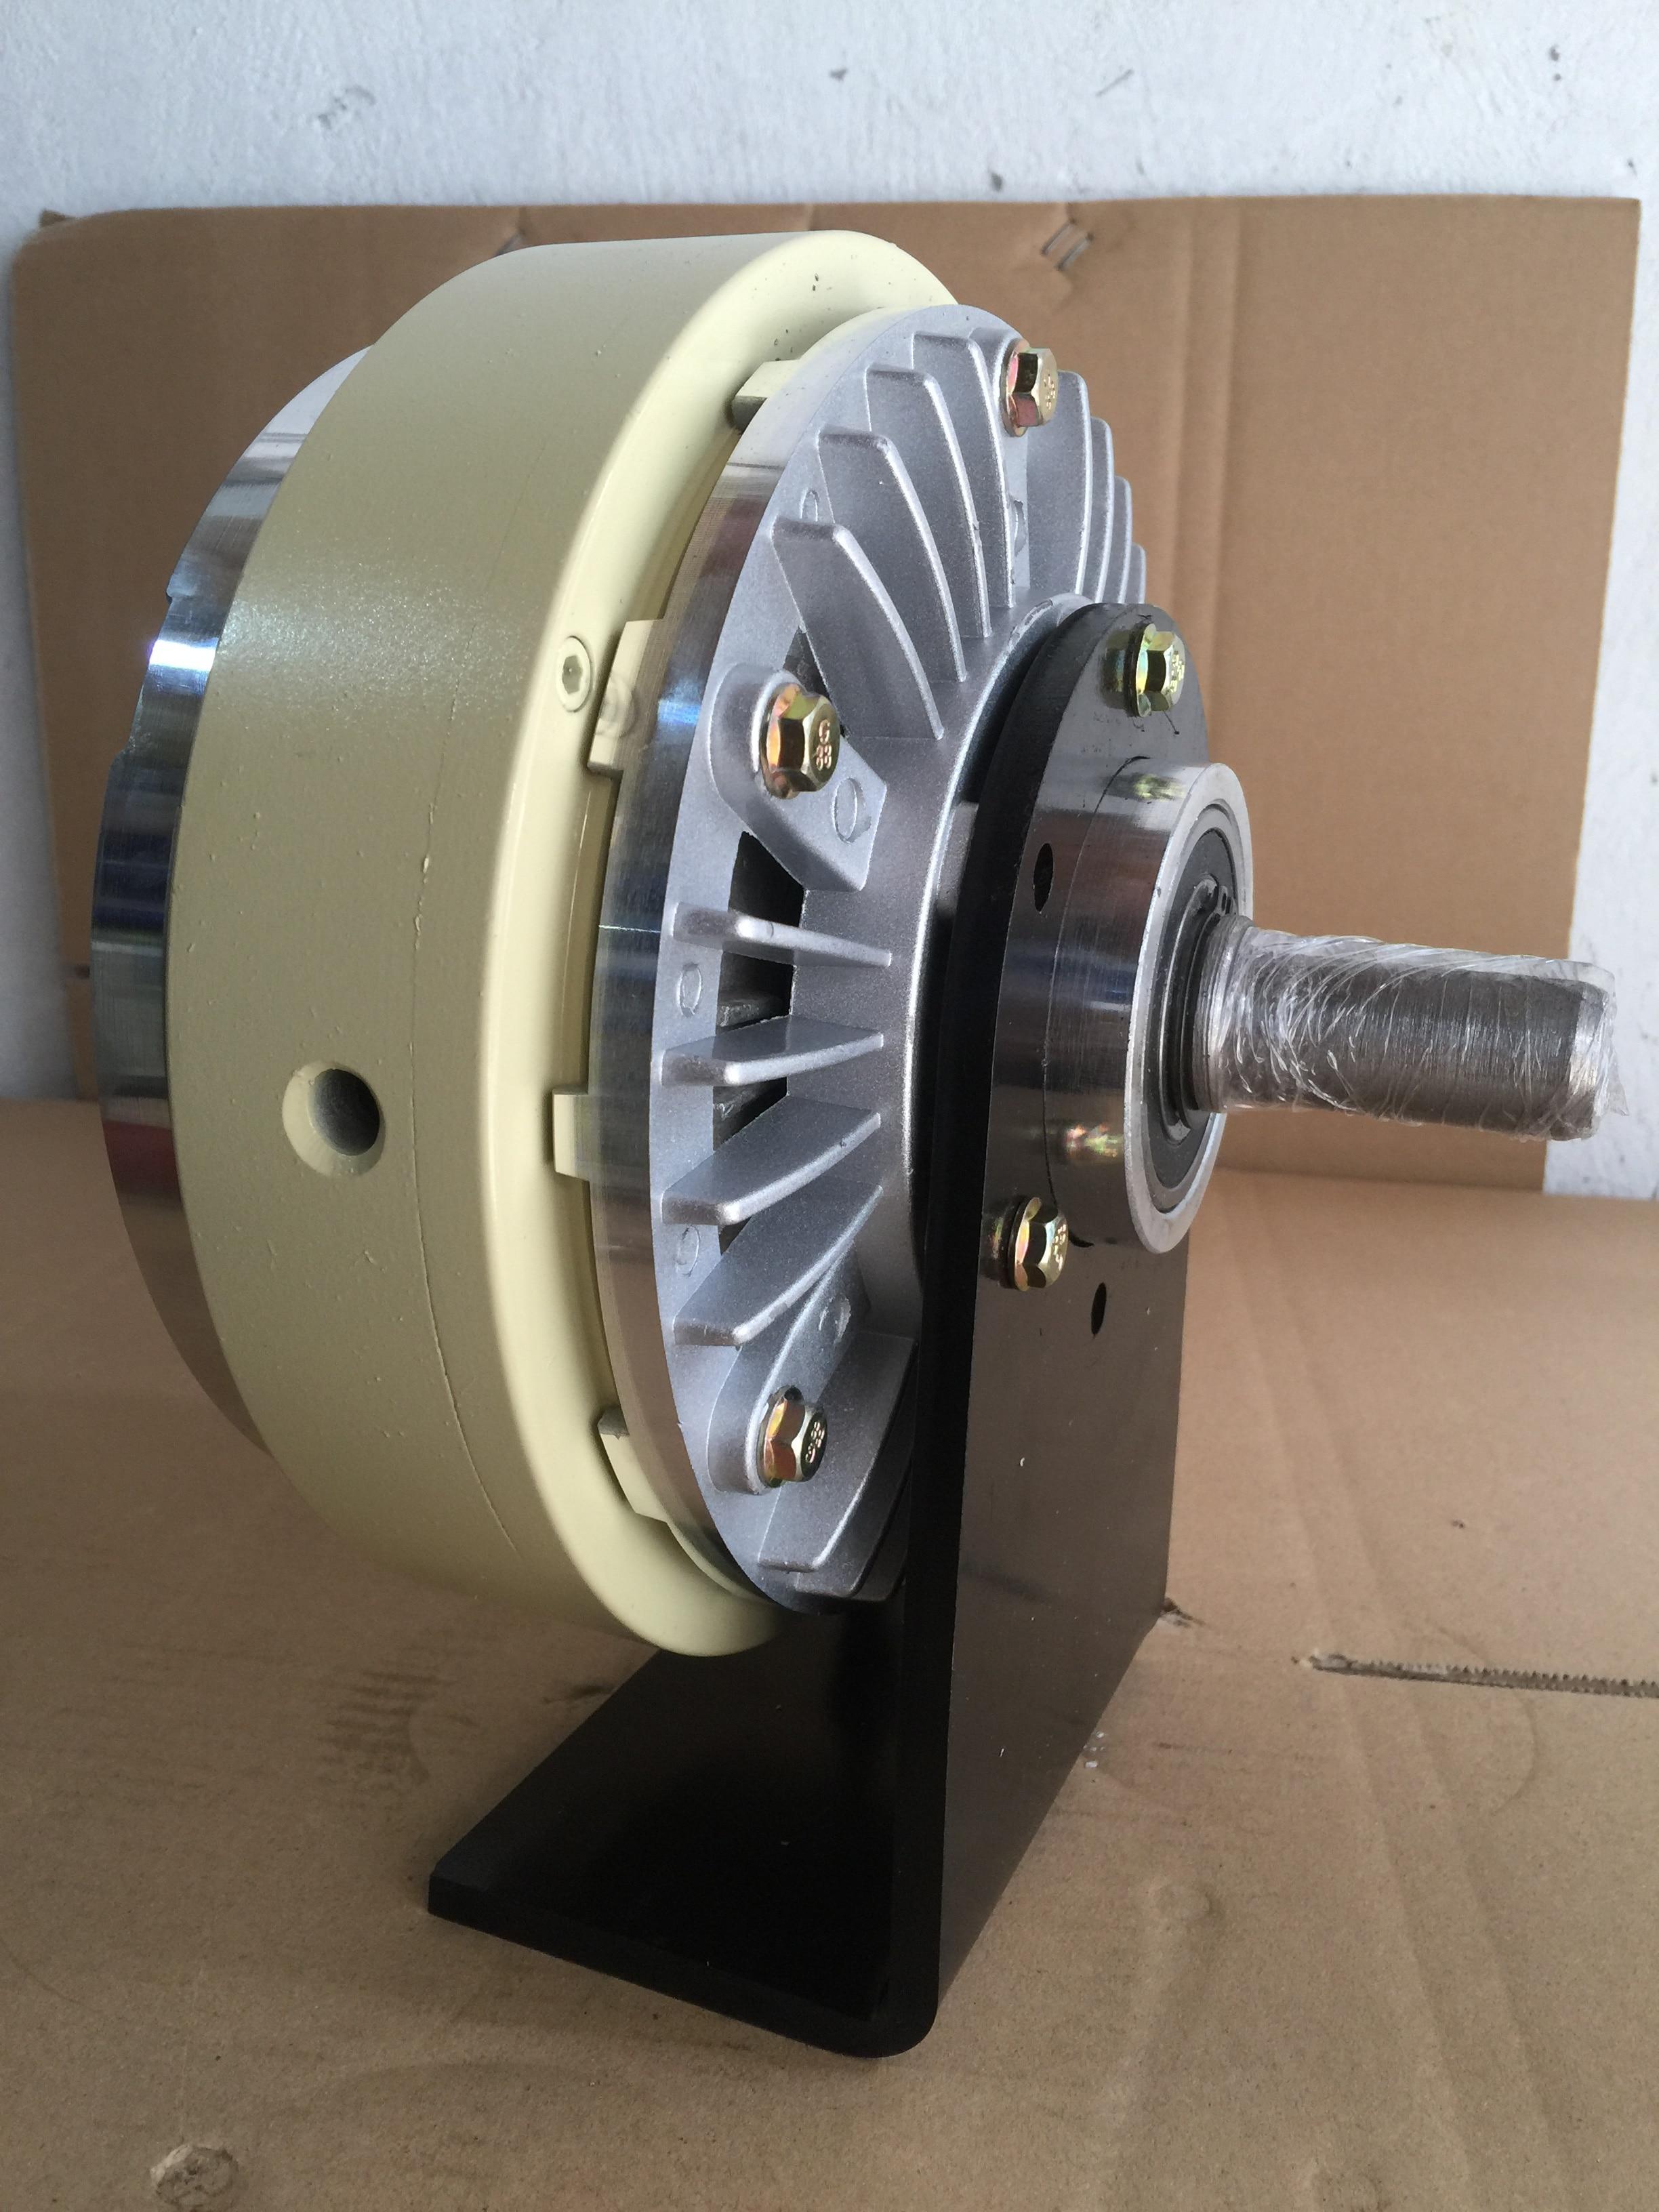 Magnetic Powder Brake Bracket Clutch Bracket Tension Single-axis Dual-axis 24V Magnetic Powder Clutch Magnetic Powder Brake